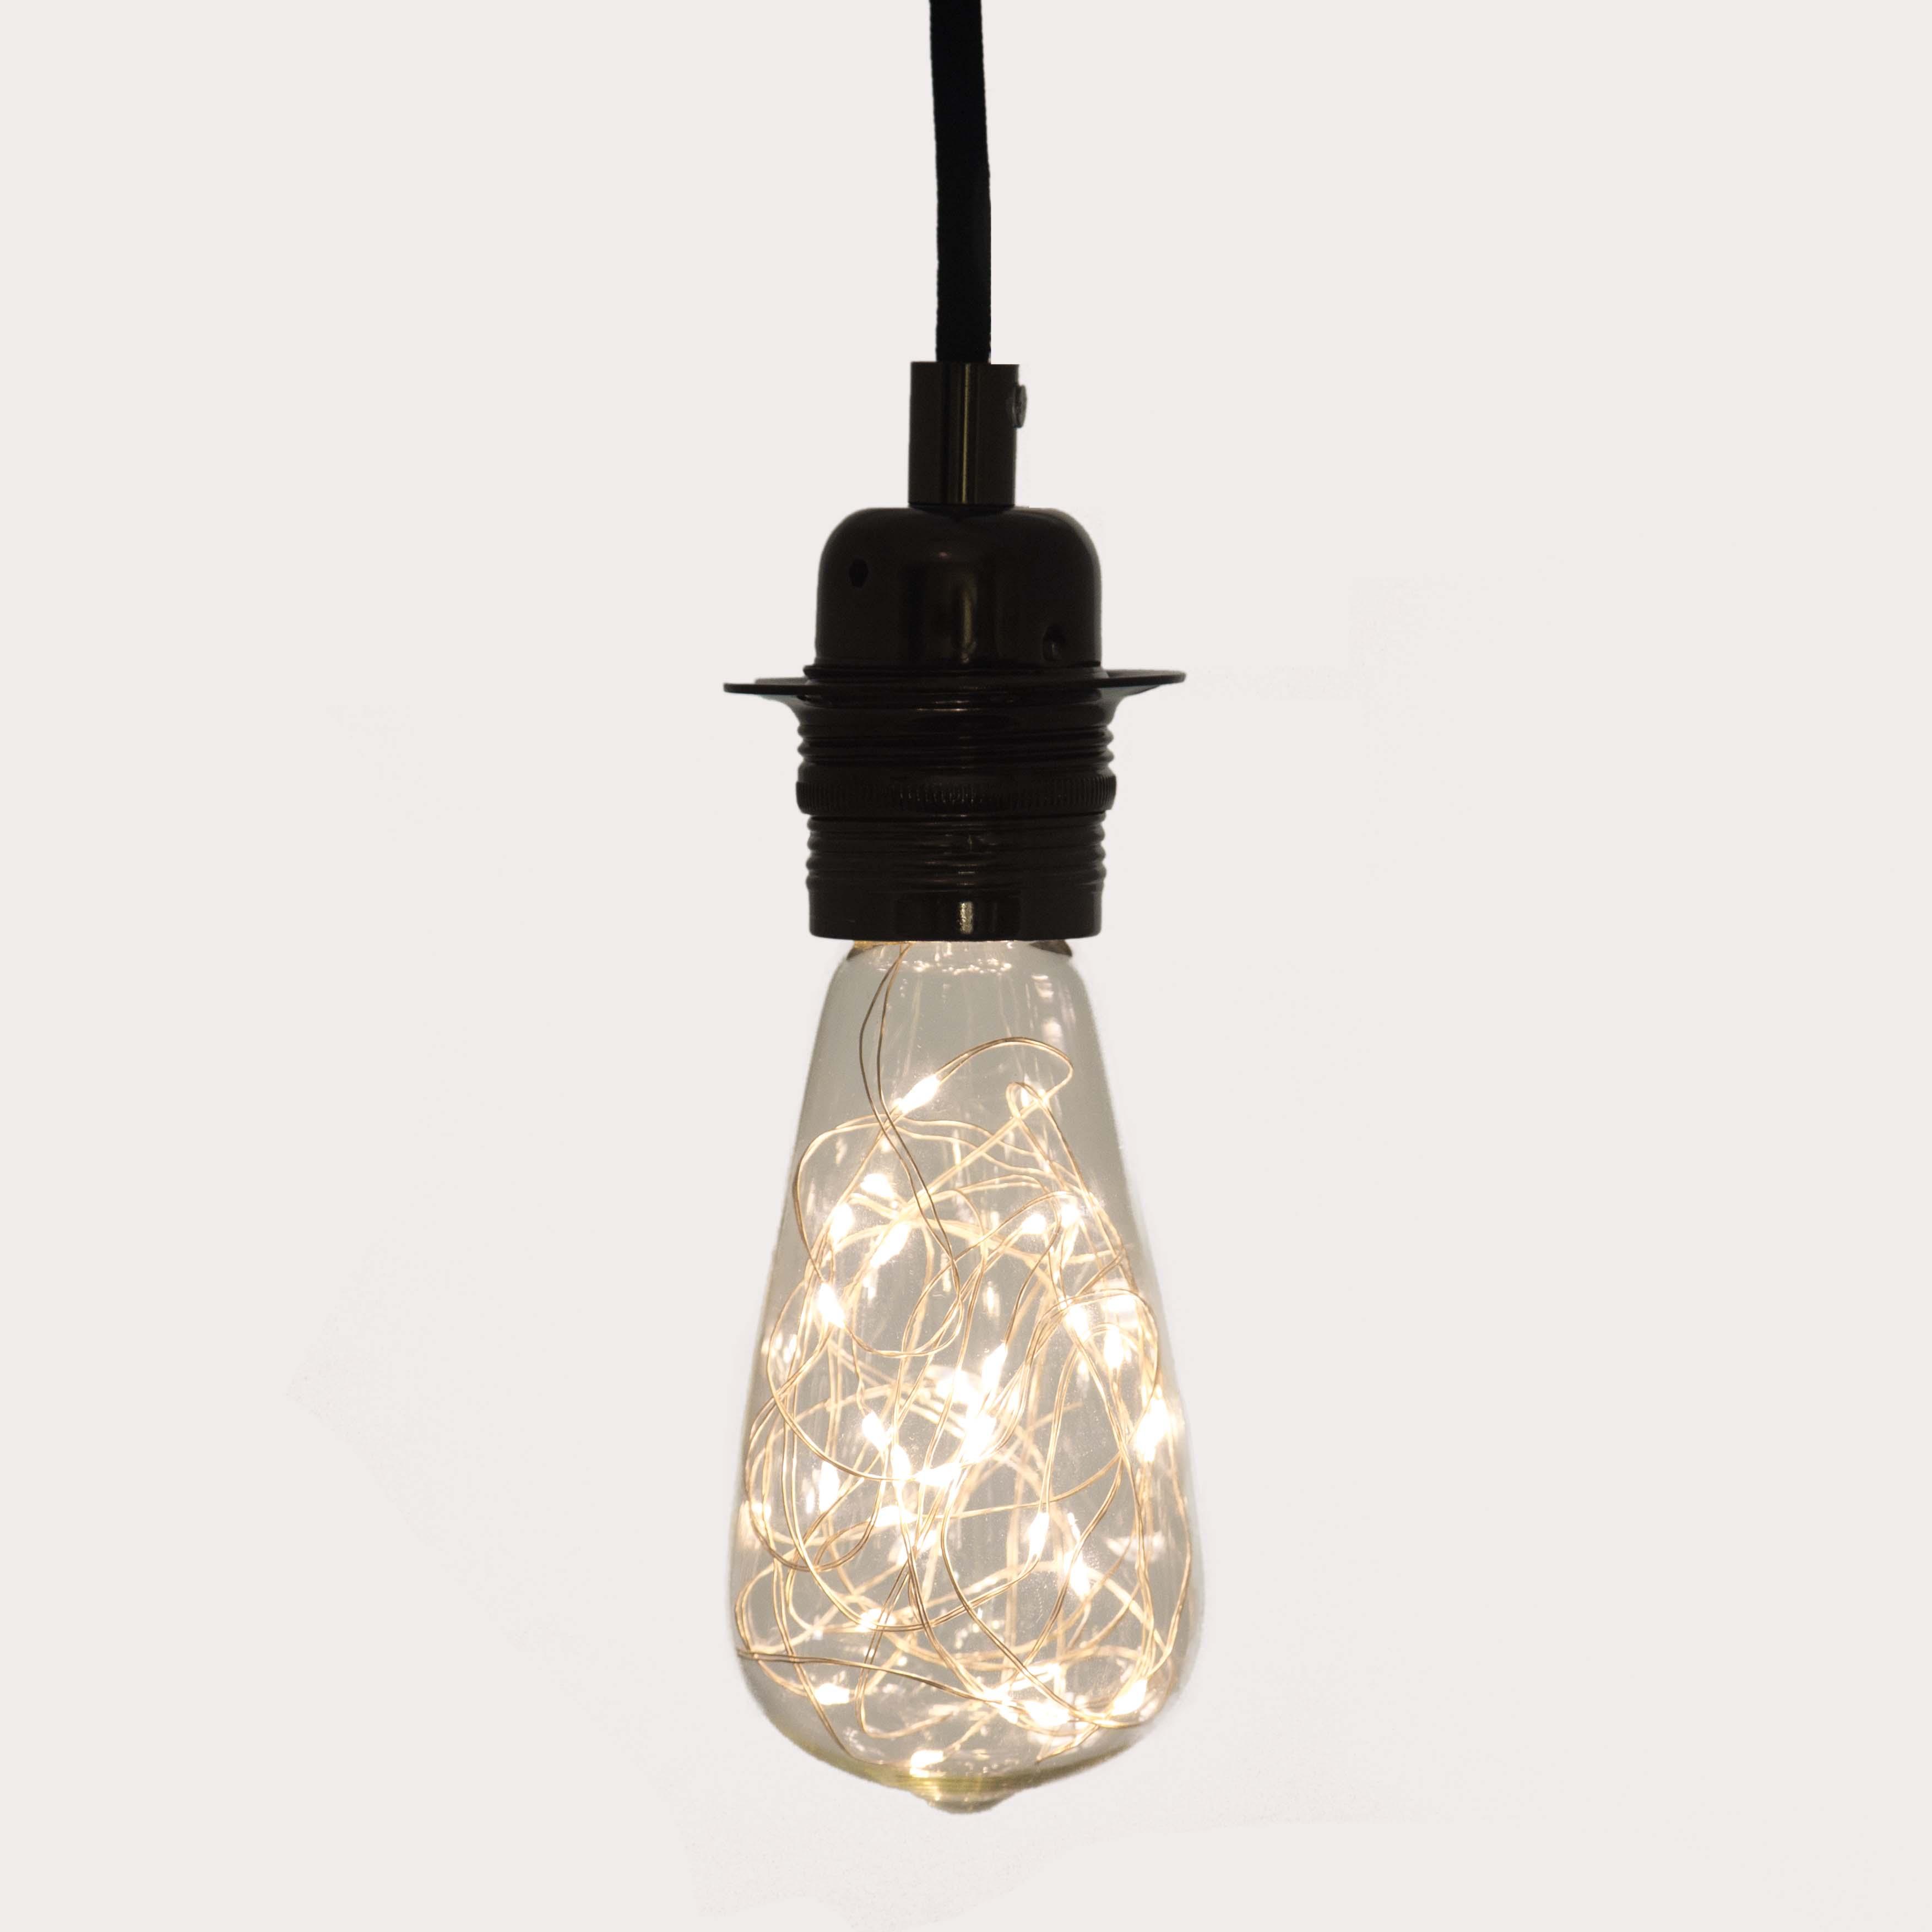 large teardrop filaments crossing led light bulb 6w e27 long life. Black Bedroom Furniture Sets. Home Design Ideas